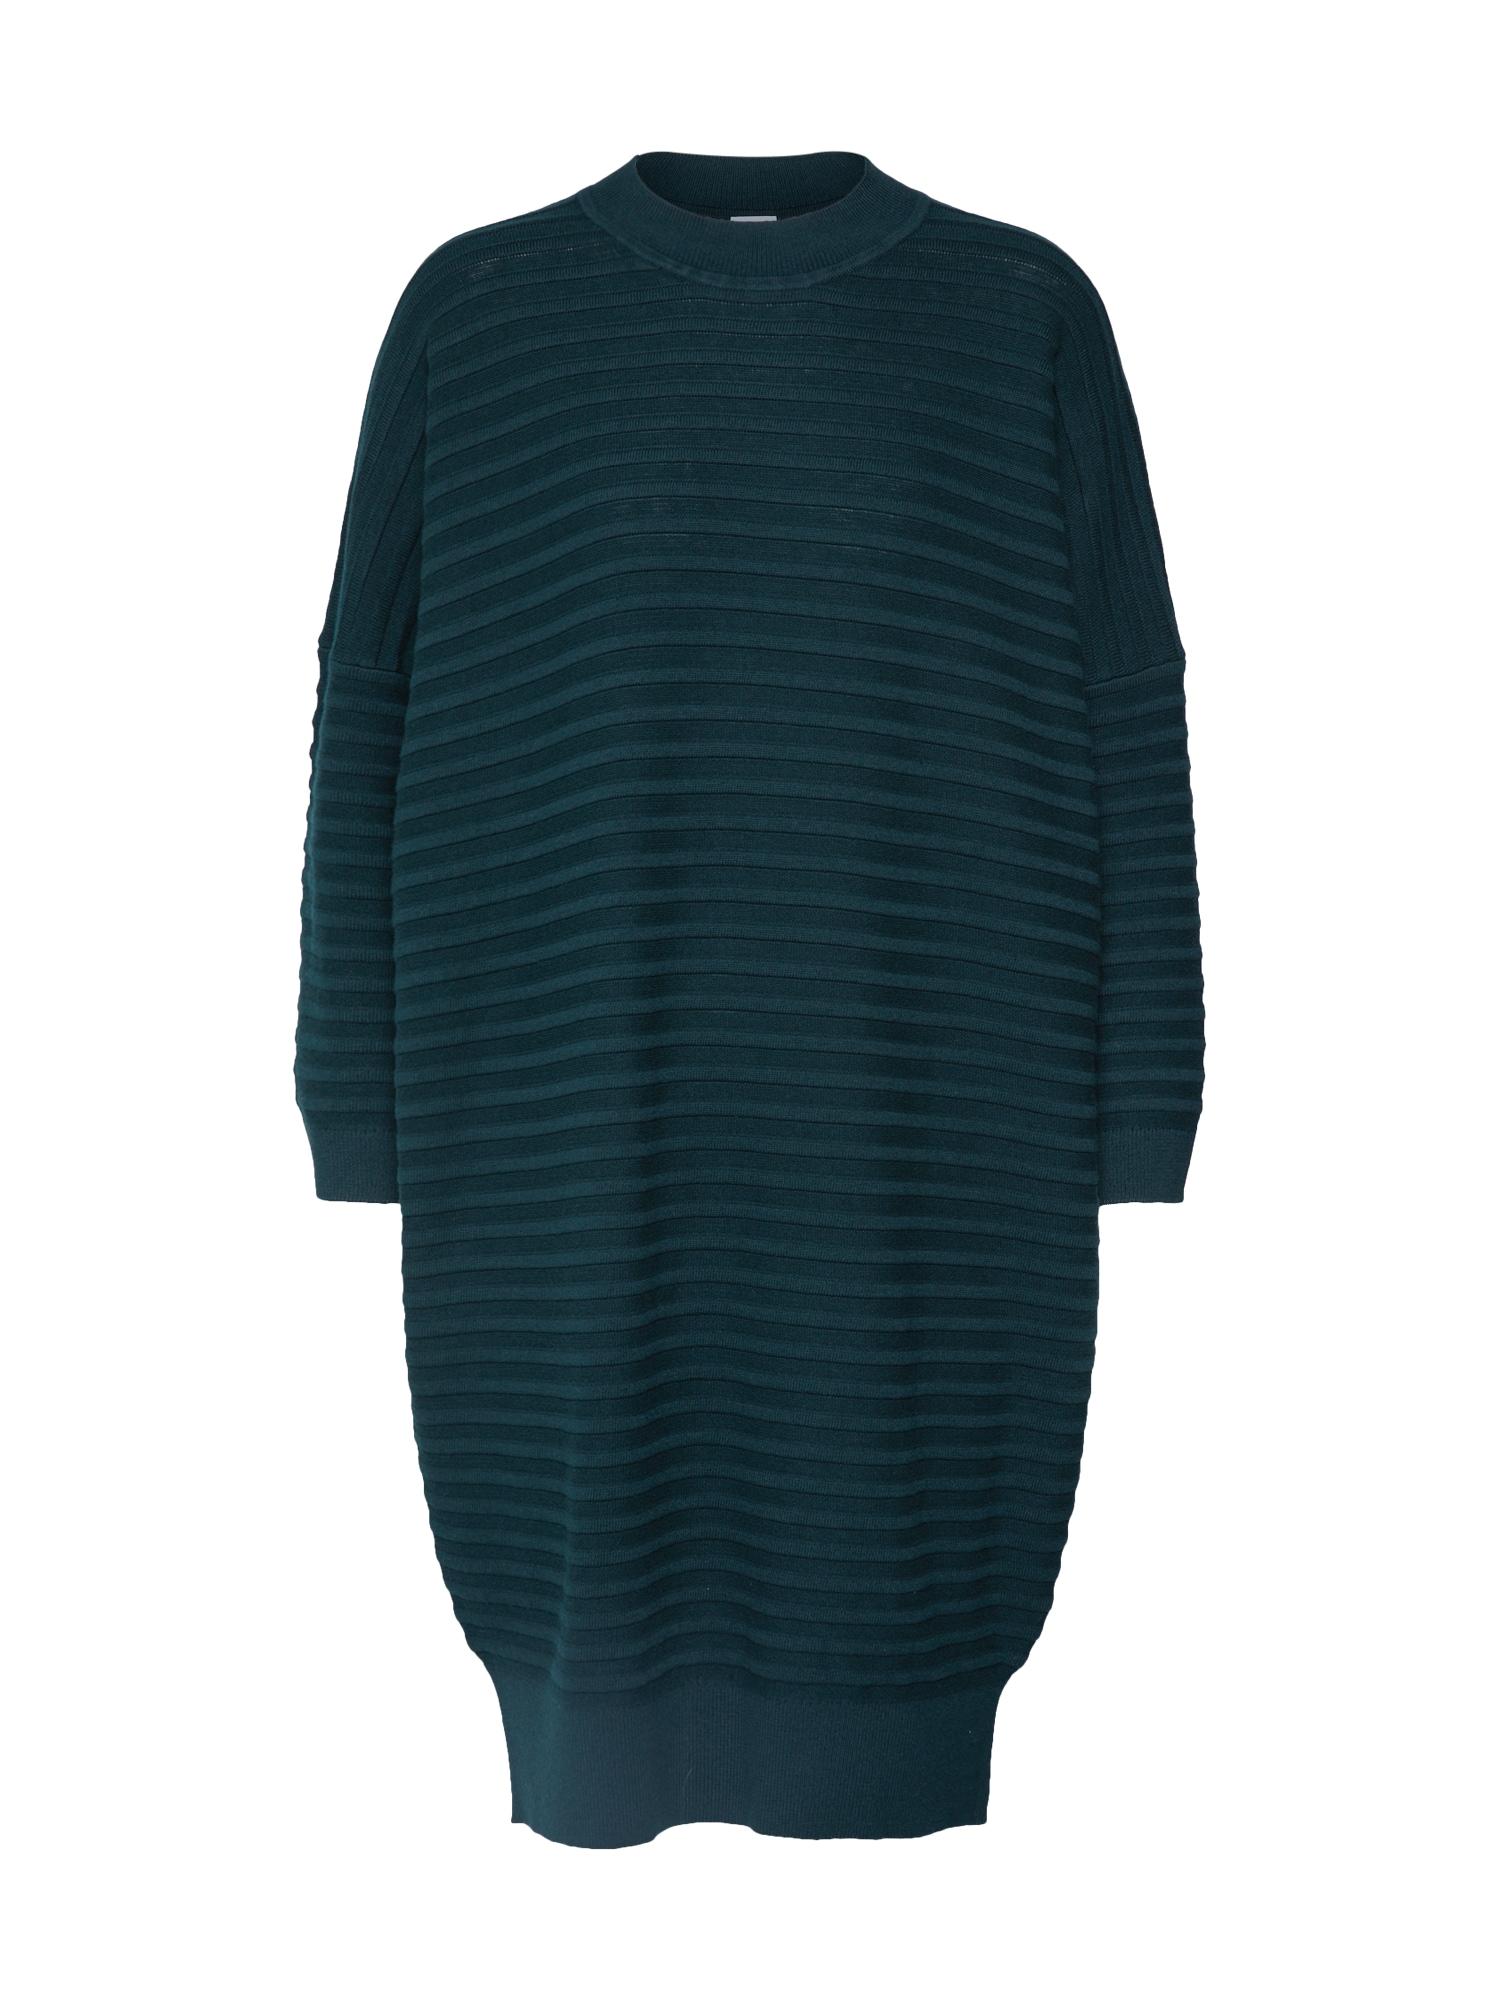 BOSS Megzta suknelė 'Islene' tamsiai žalia